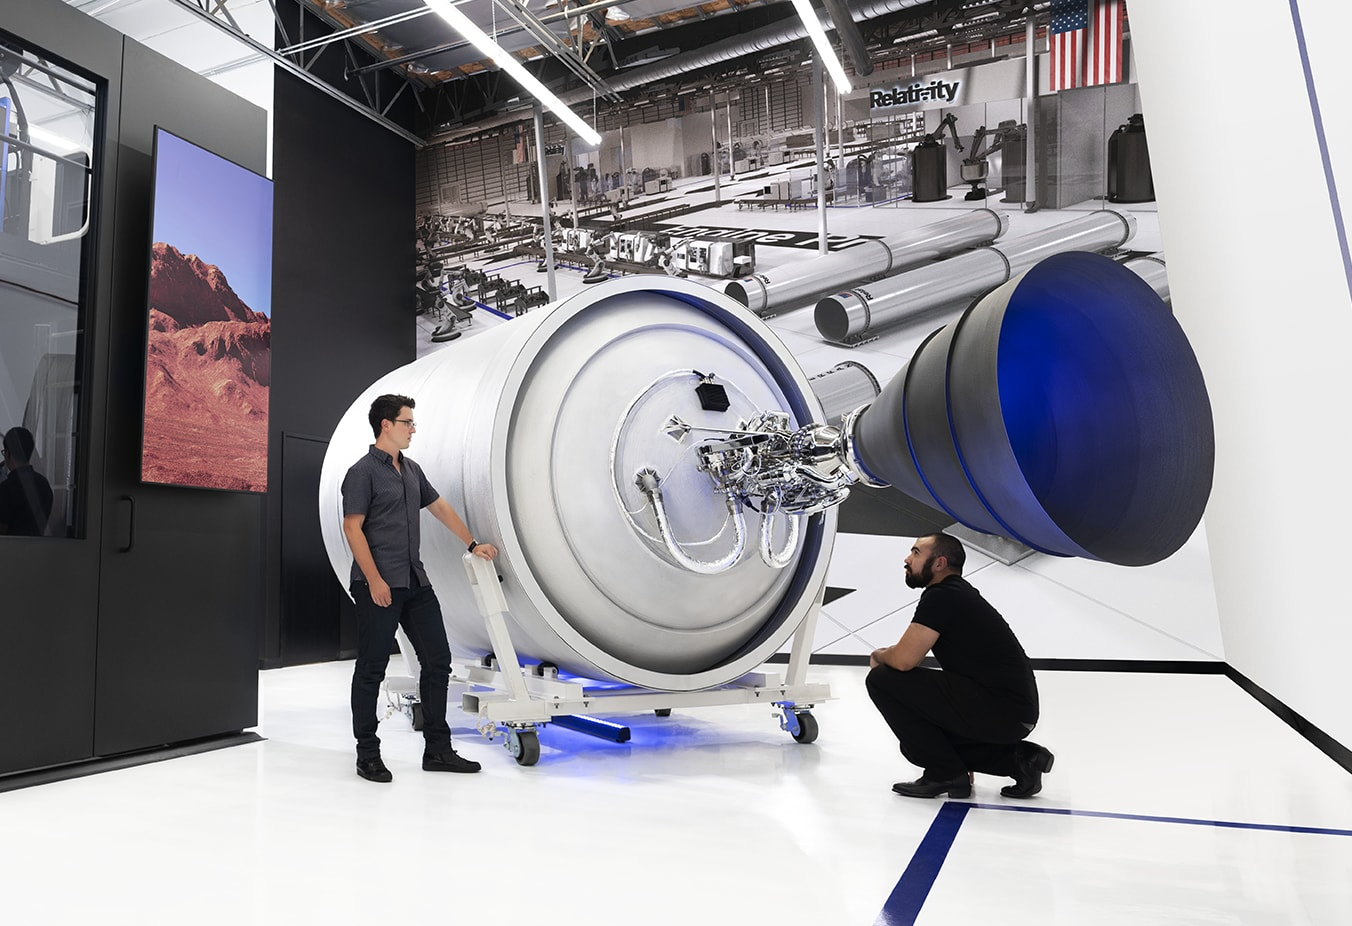 iridium rocket california relativity launchpad